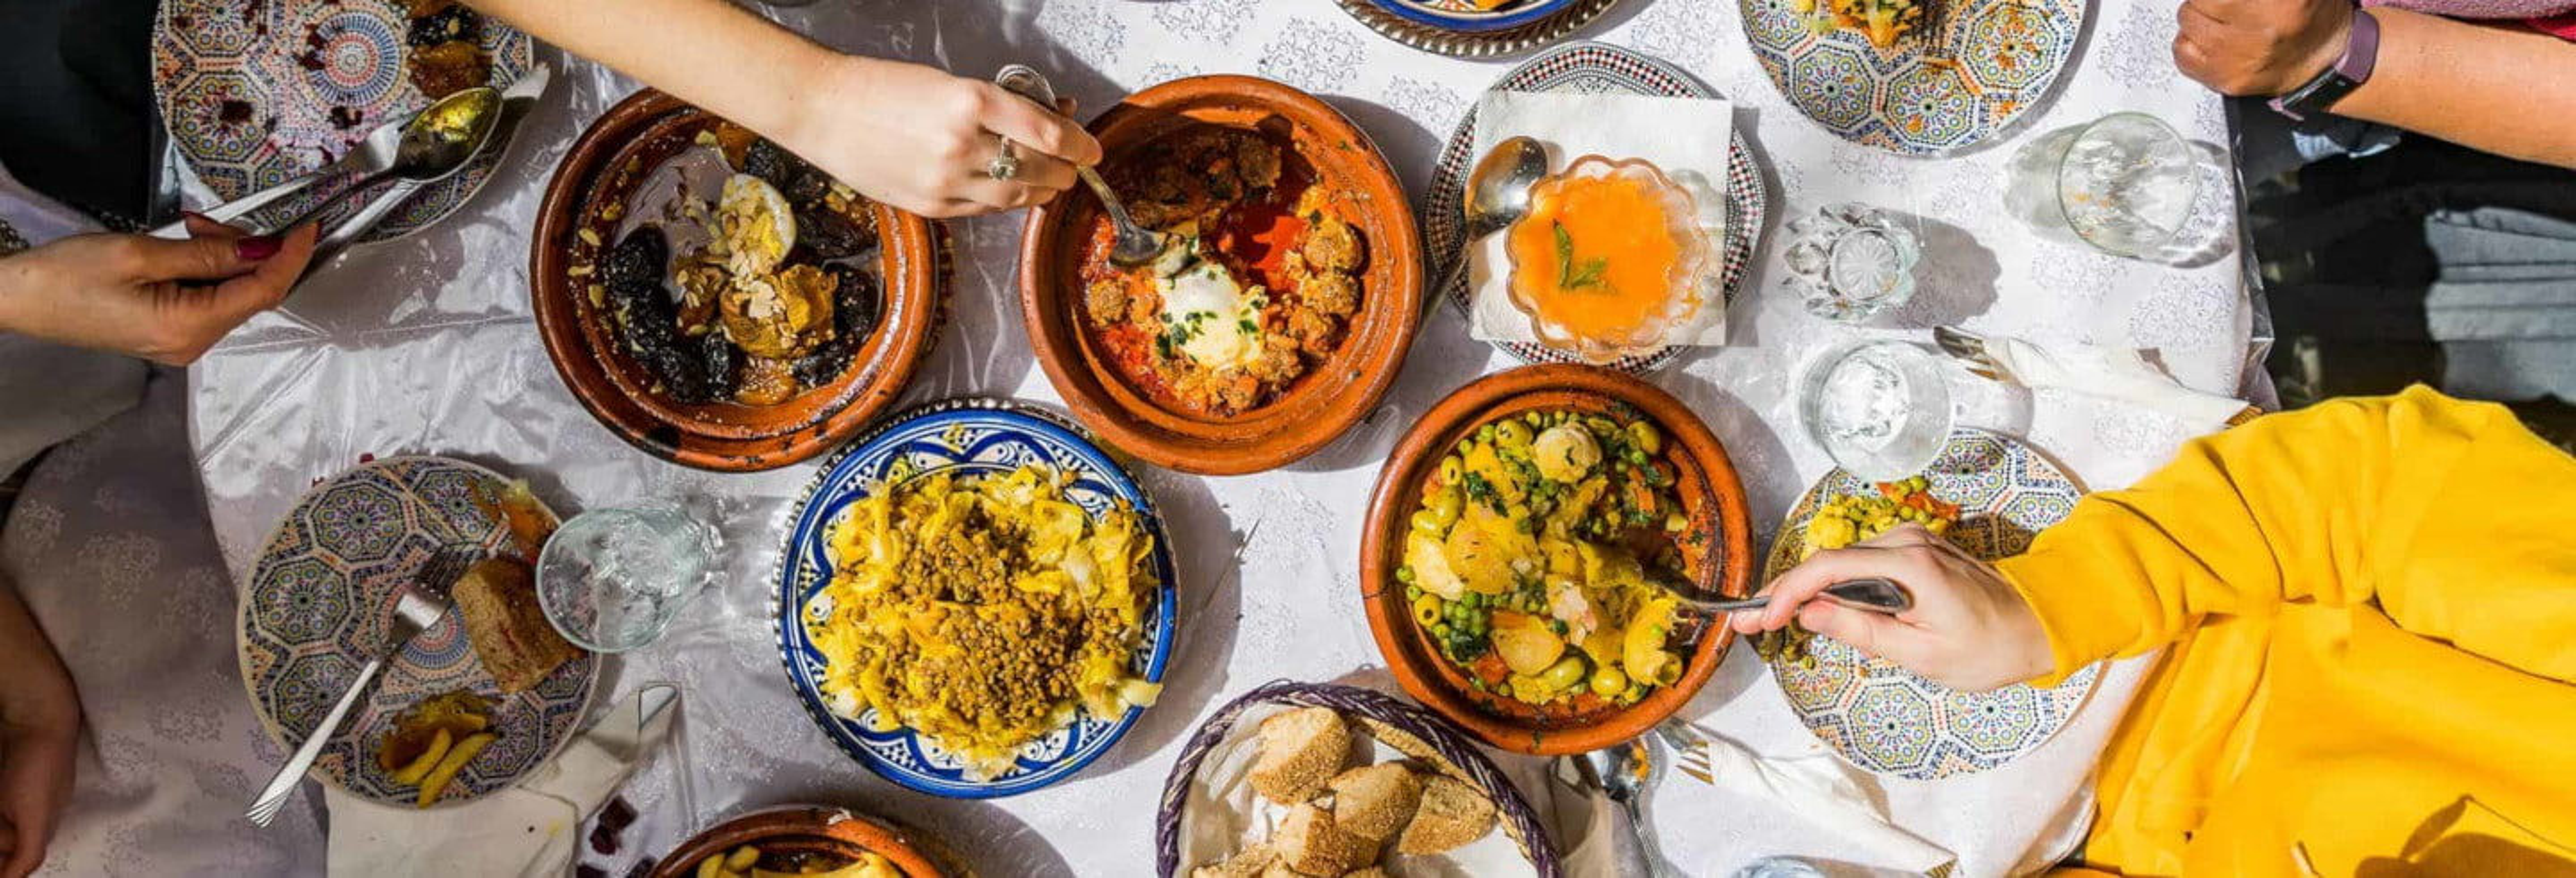 Tour gastronómico por Rabat